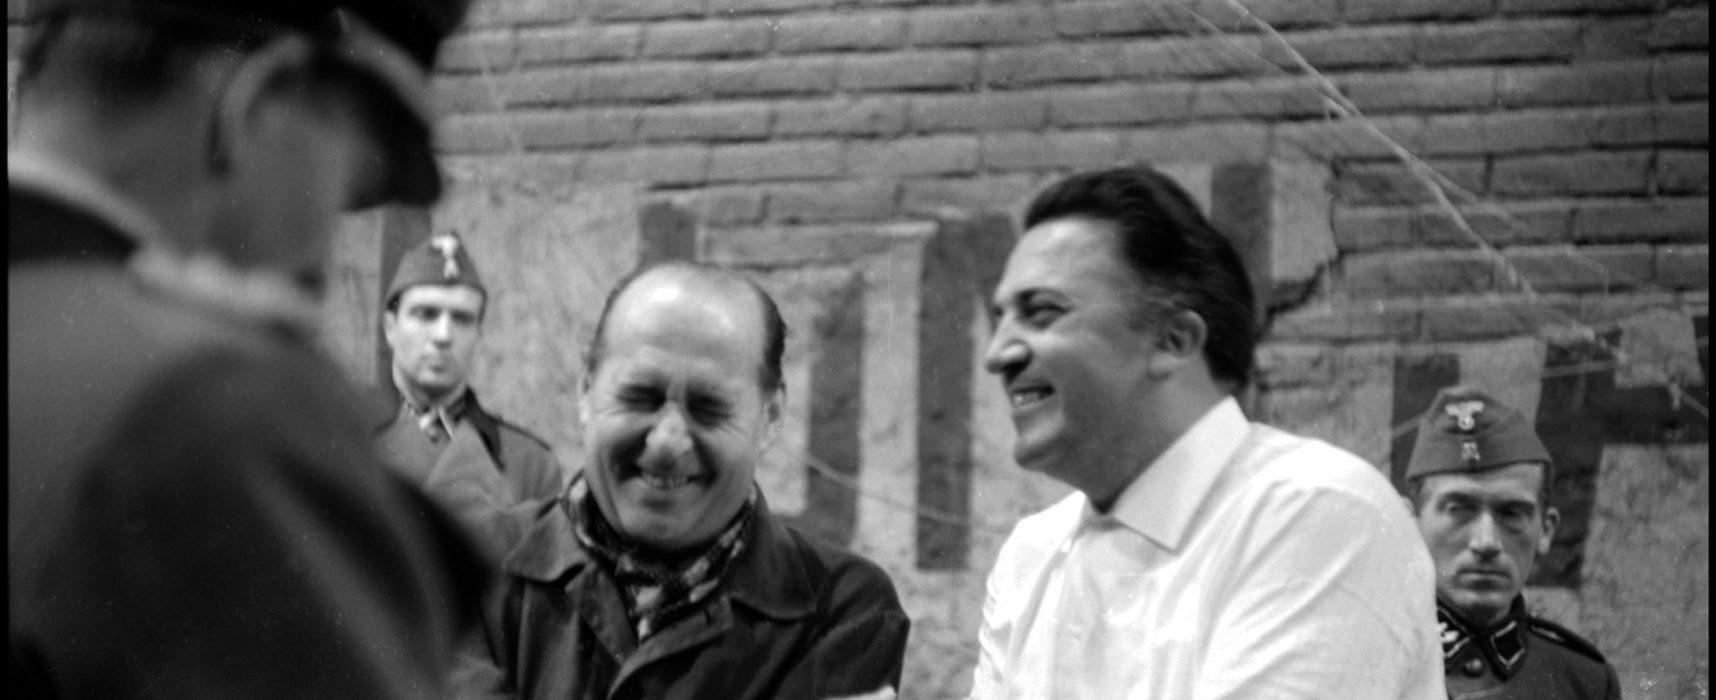 Incontri Cinema Sorrento, Salemme per 40 anni carriera